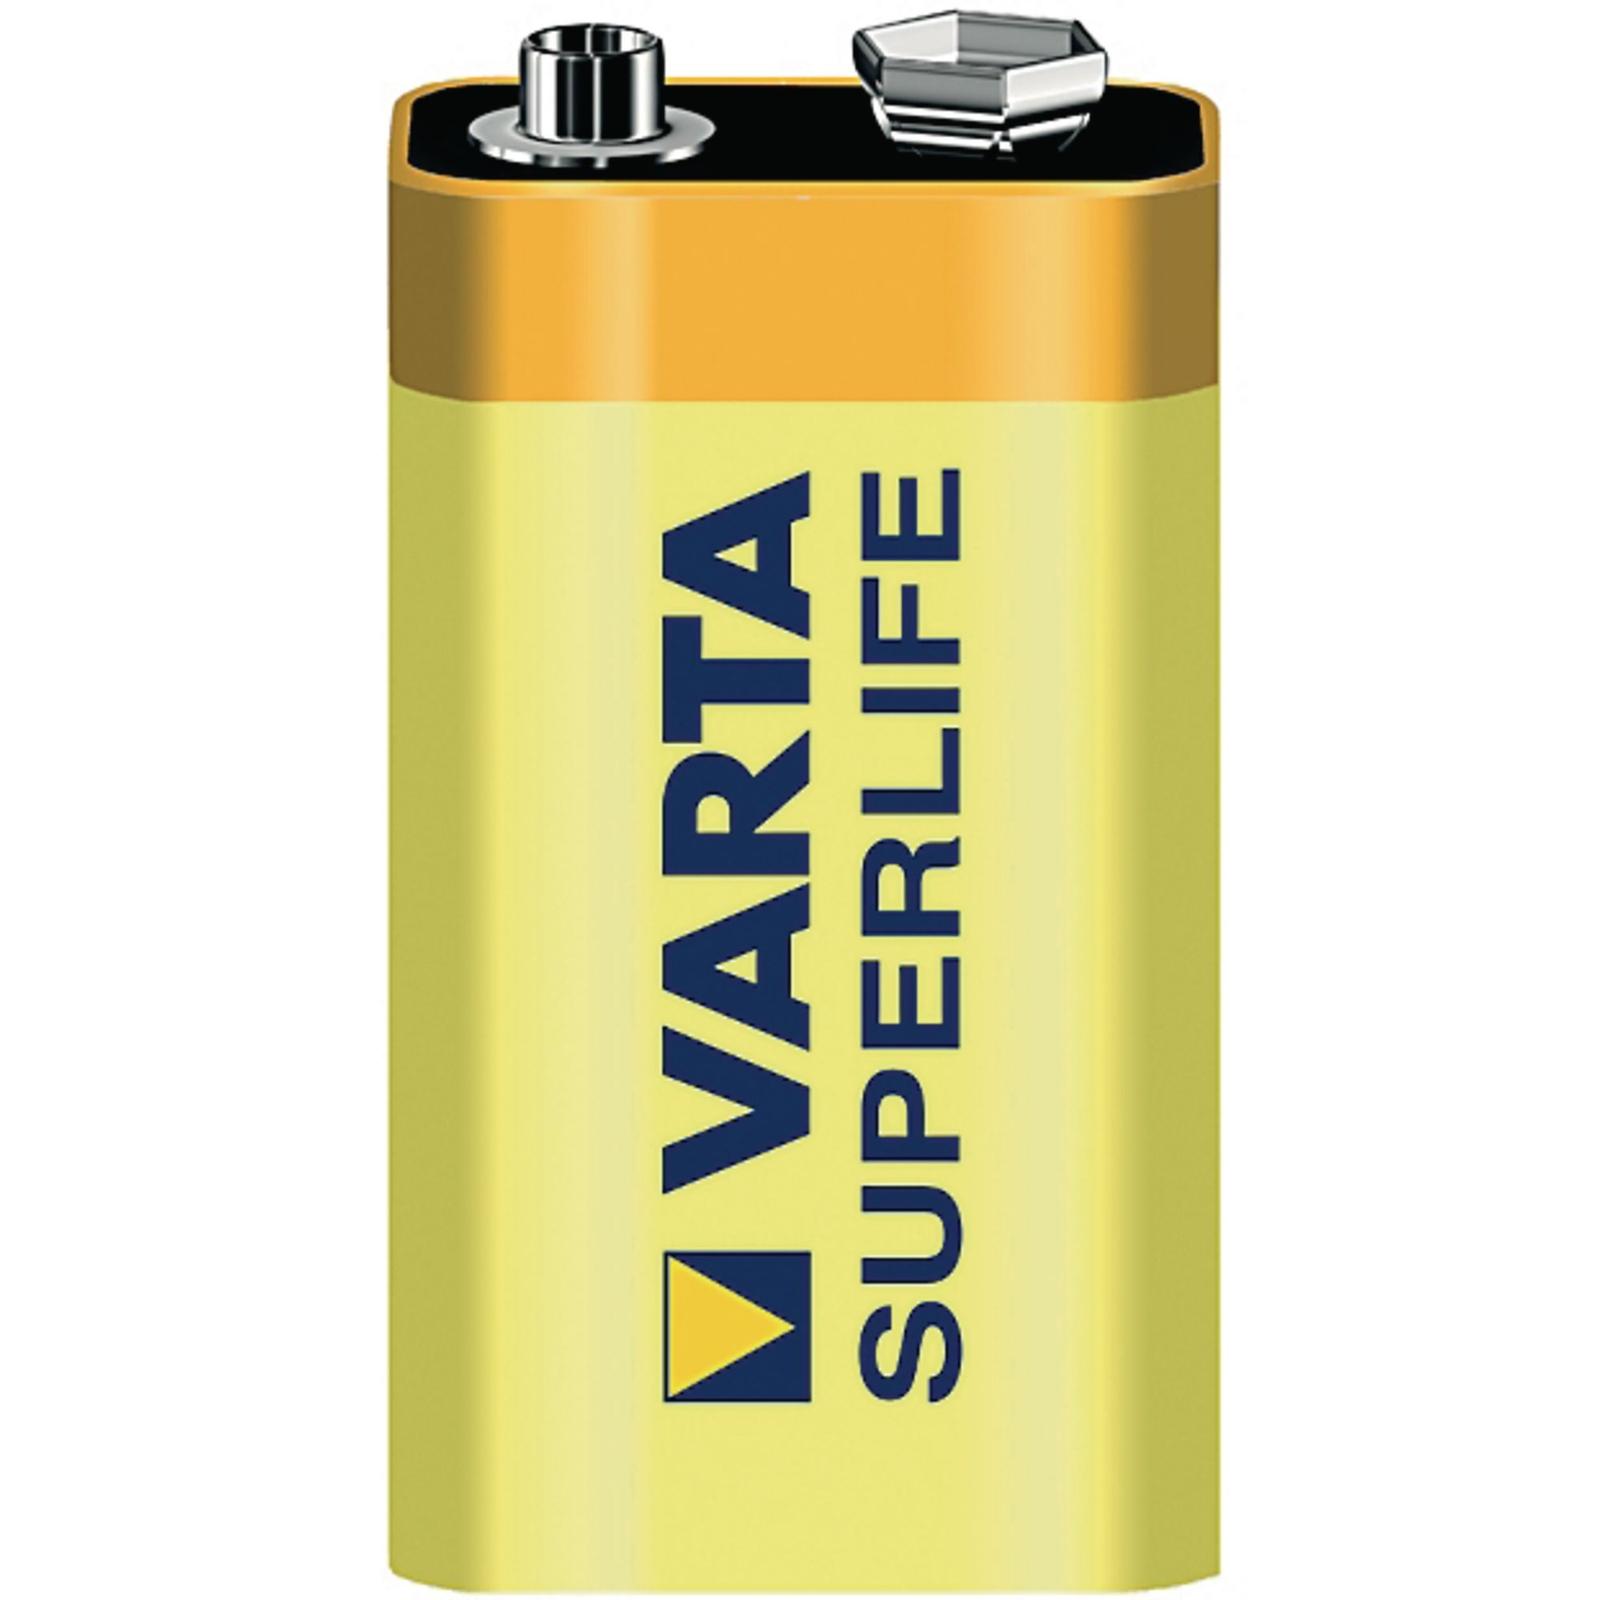 High Power Zinc Chloride Battery - 9V, PP3